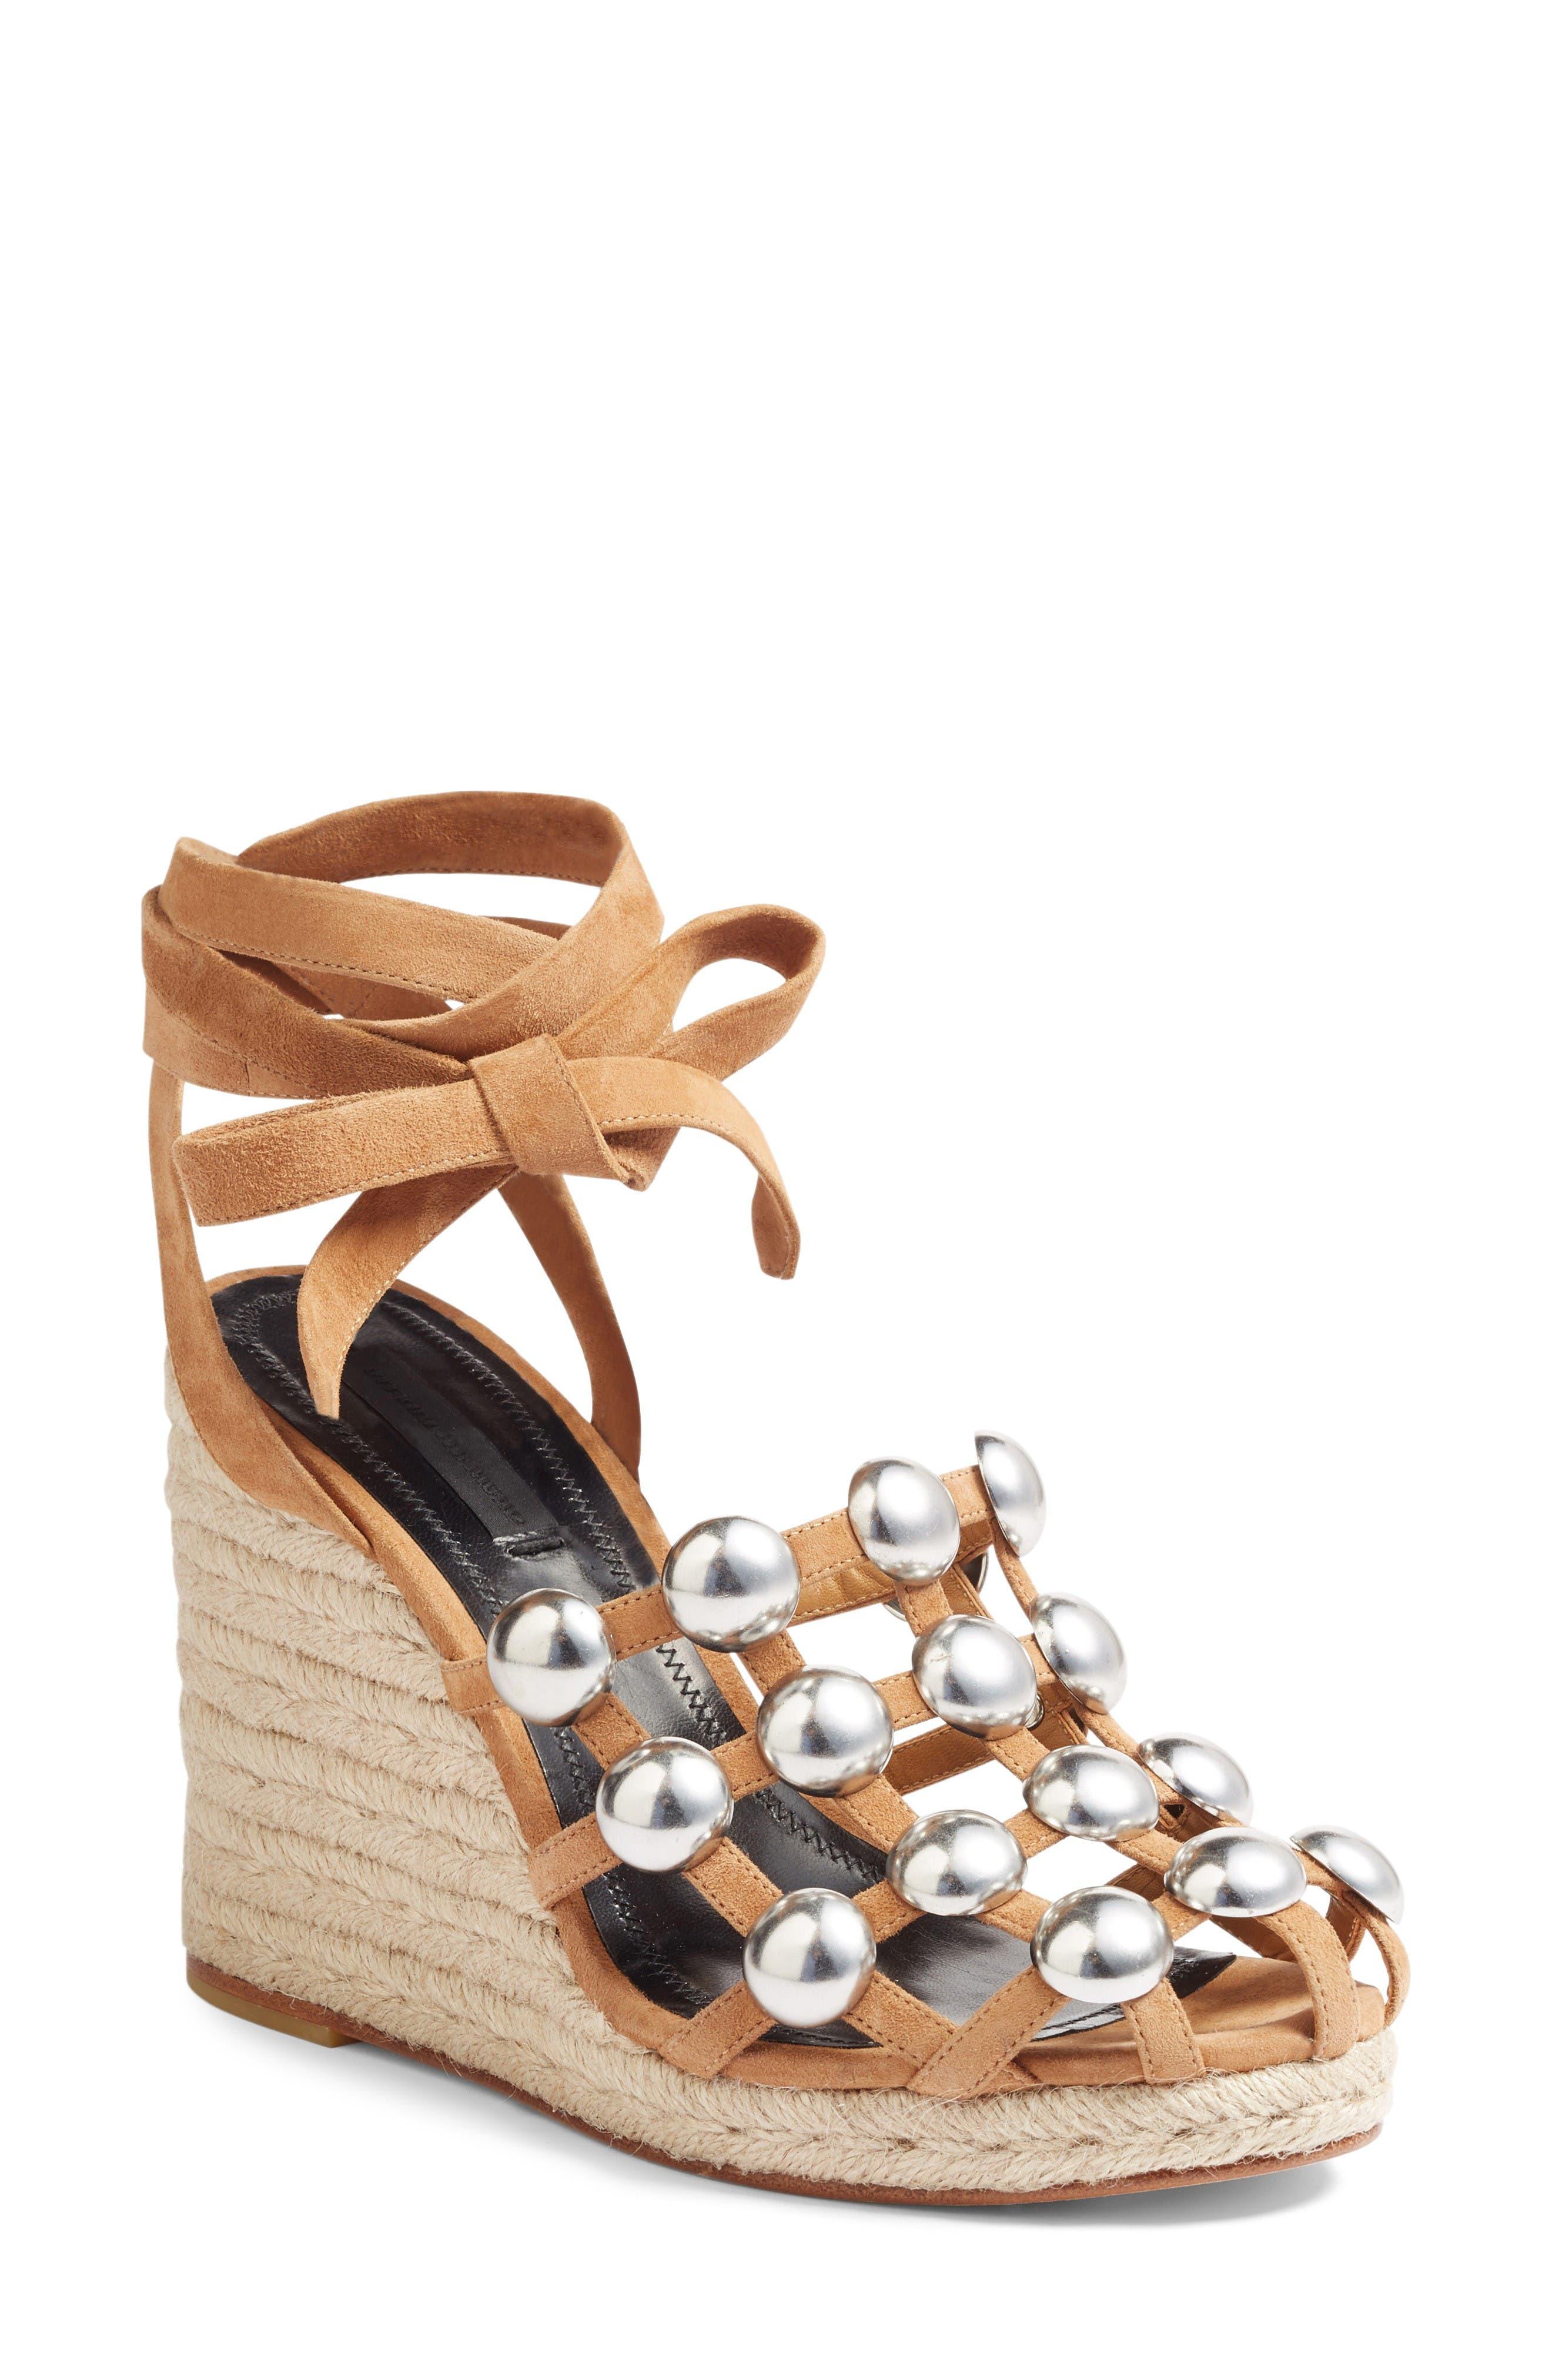 Alternate Image 1 Selected - Alexander Wang Taylor Stud Wedge Sandal (Women)